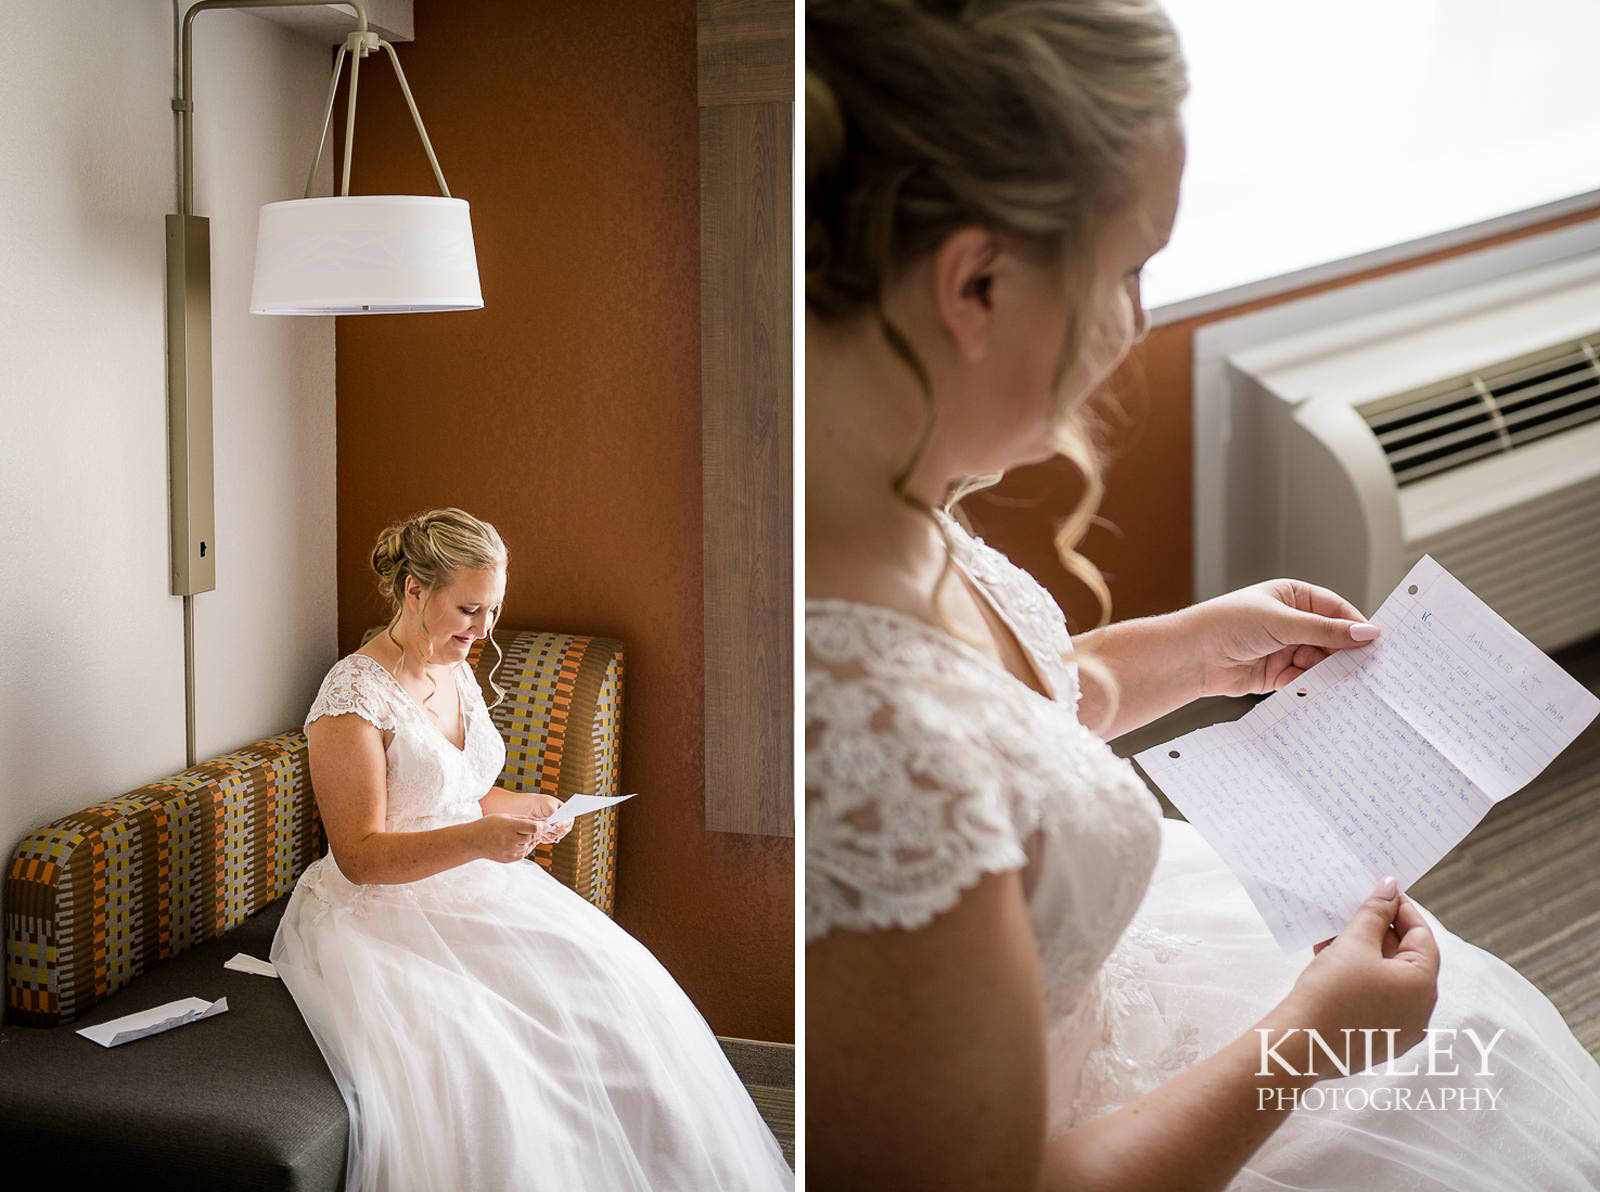 16-Holiday-Inn-Webster-NY-Wedding-Getting-Ready-Photography.jpg